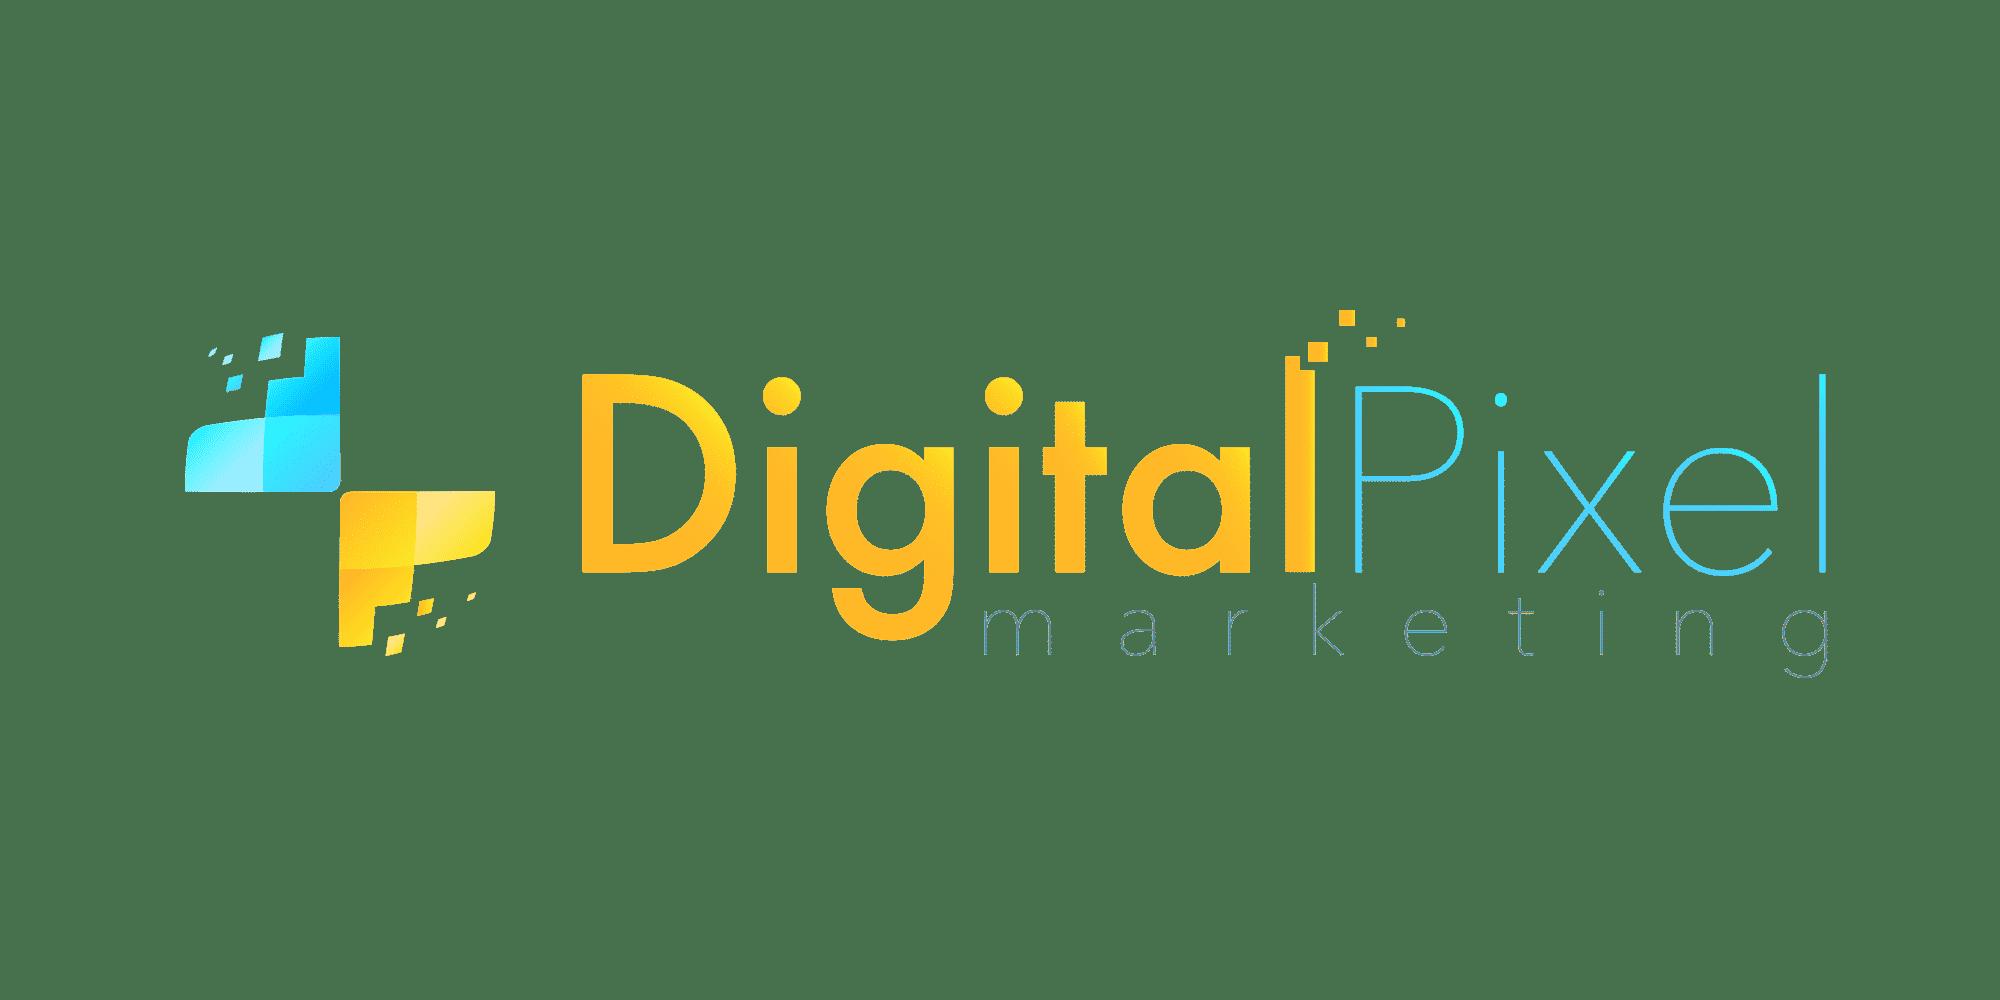 Digital Pixel Marketing